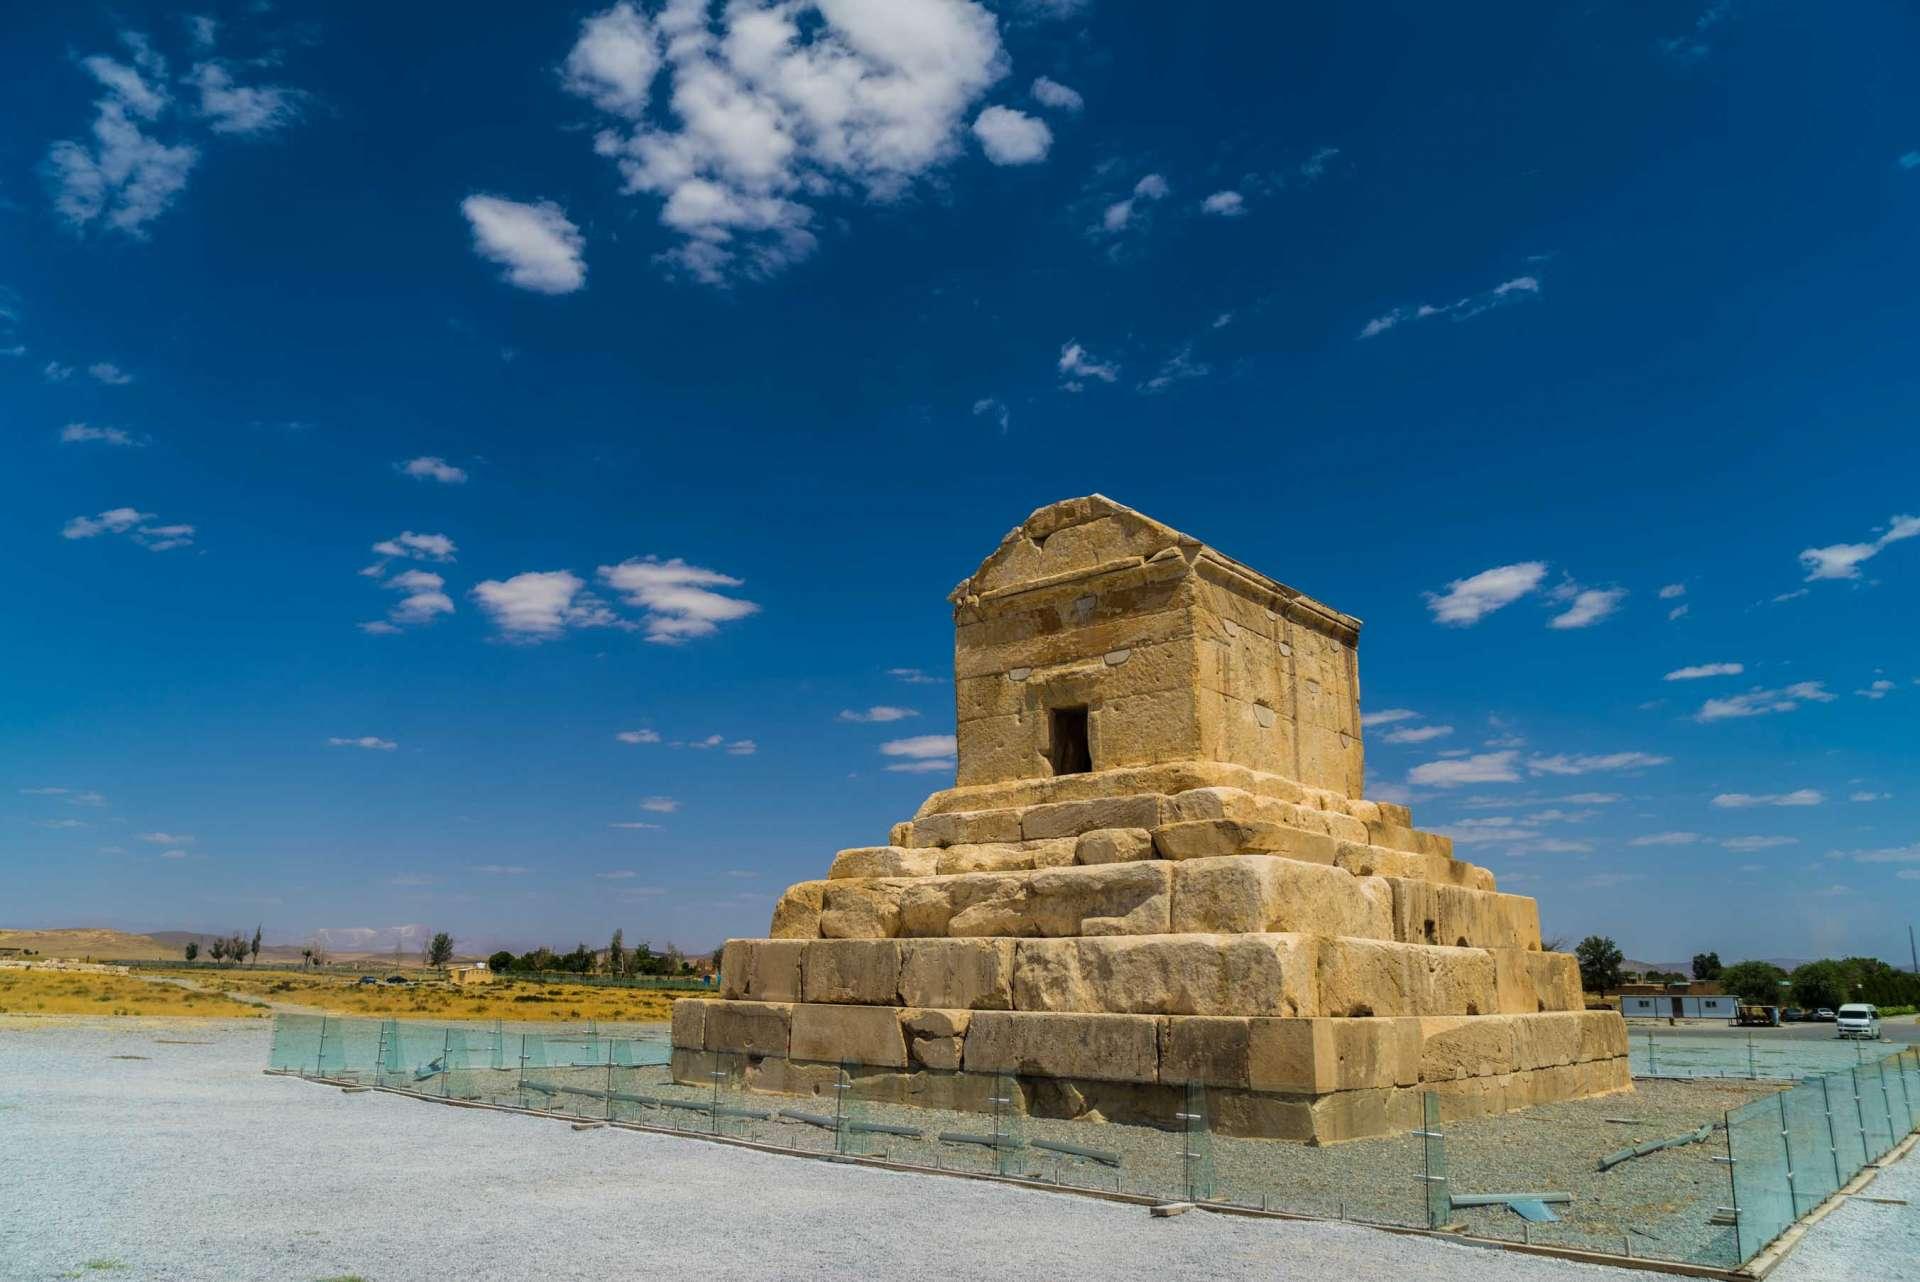 Persepolis Iran - Pasagardae Tomb of Cyrus